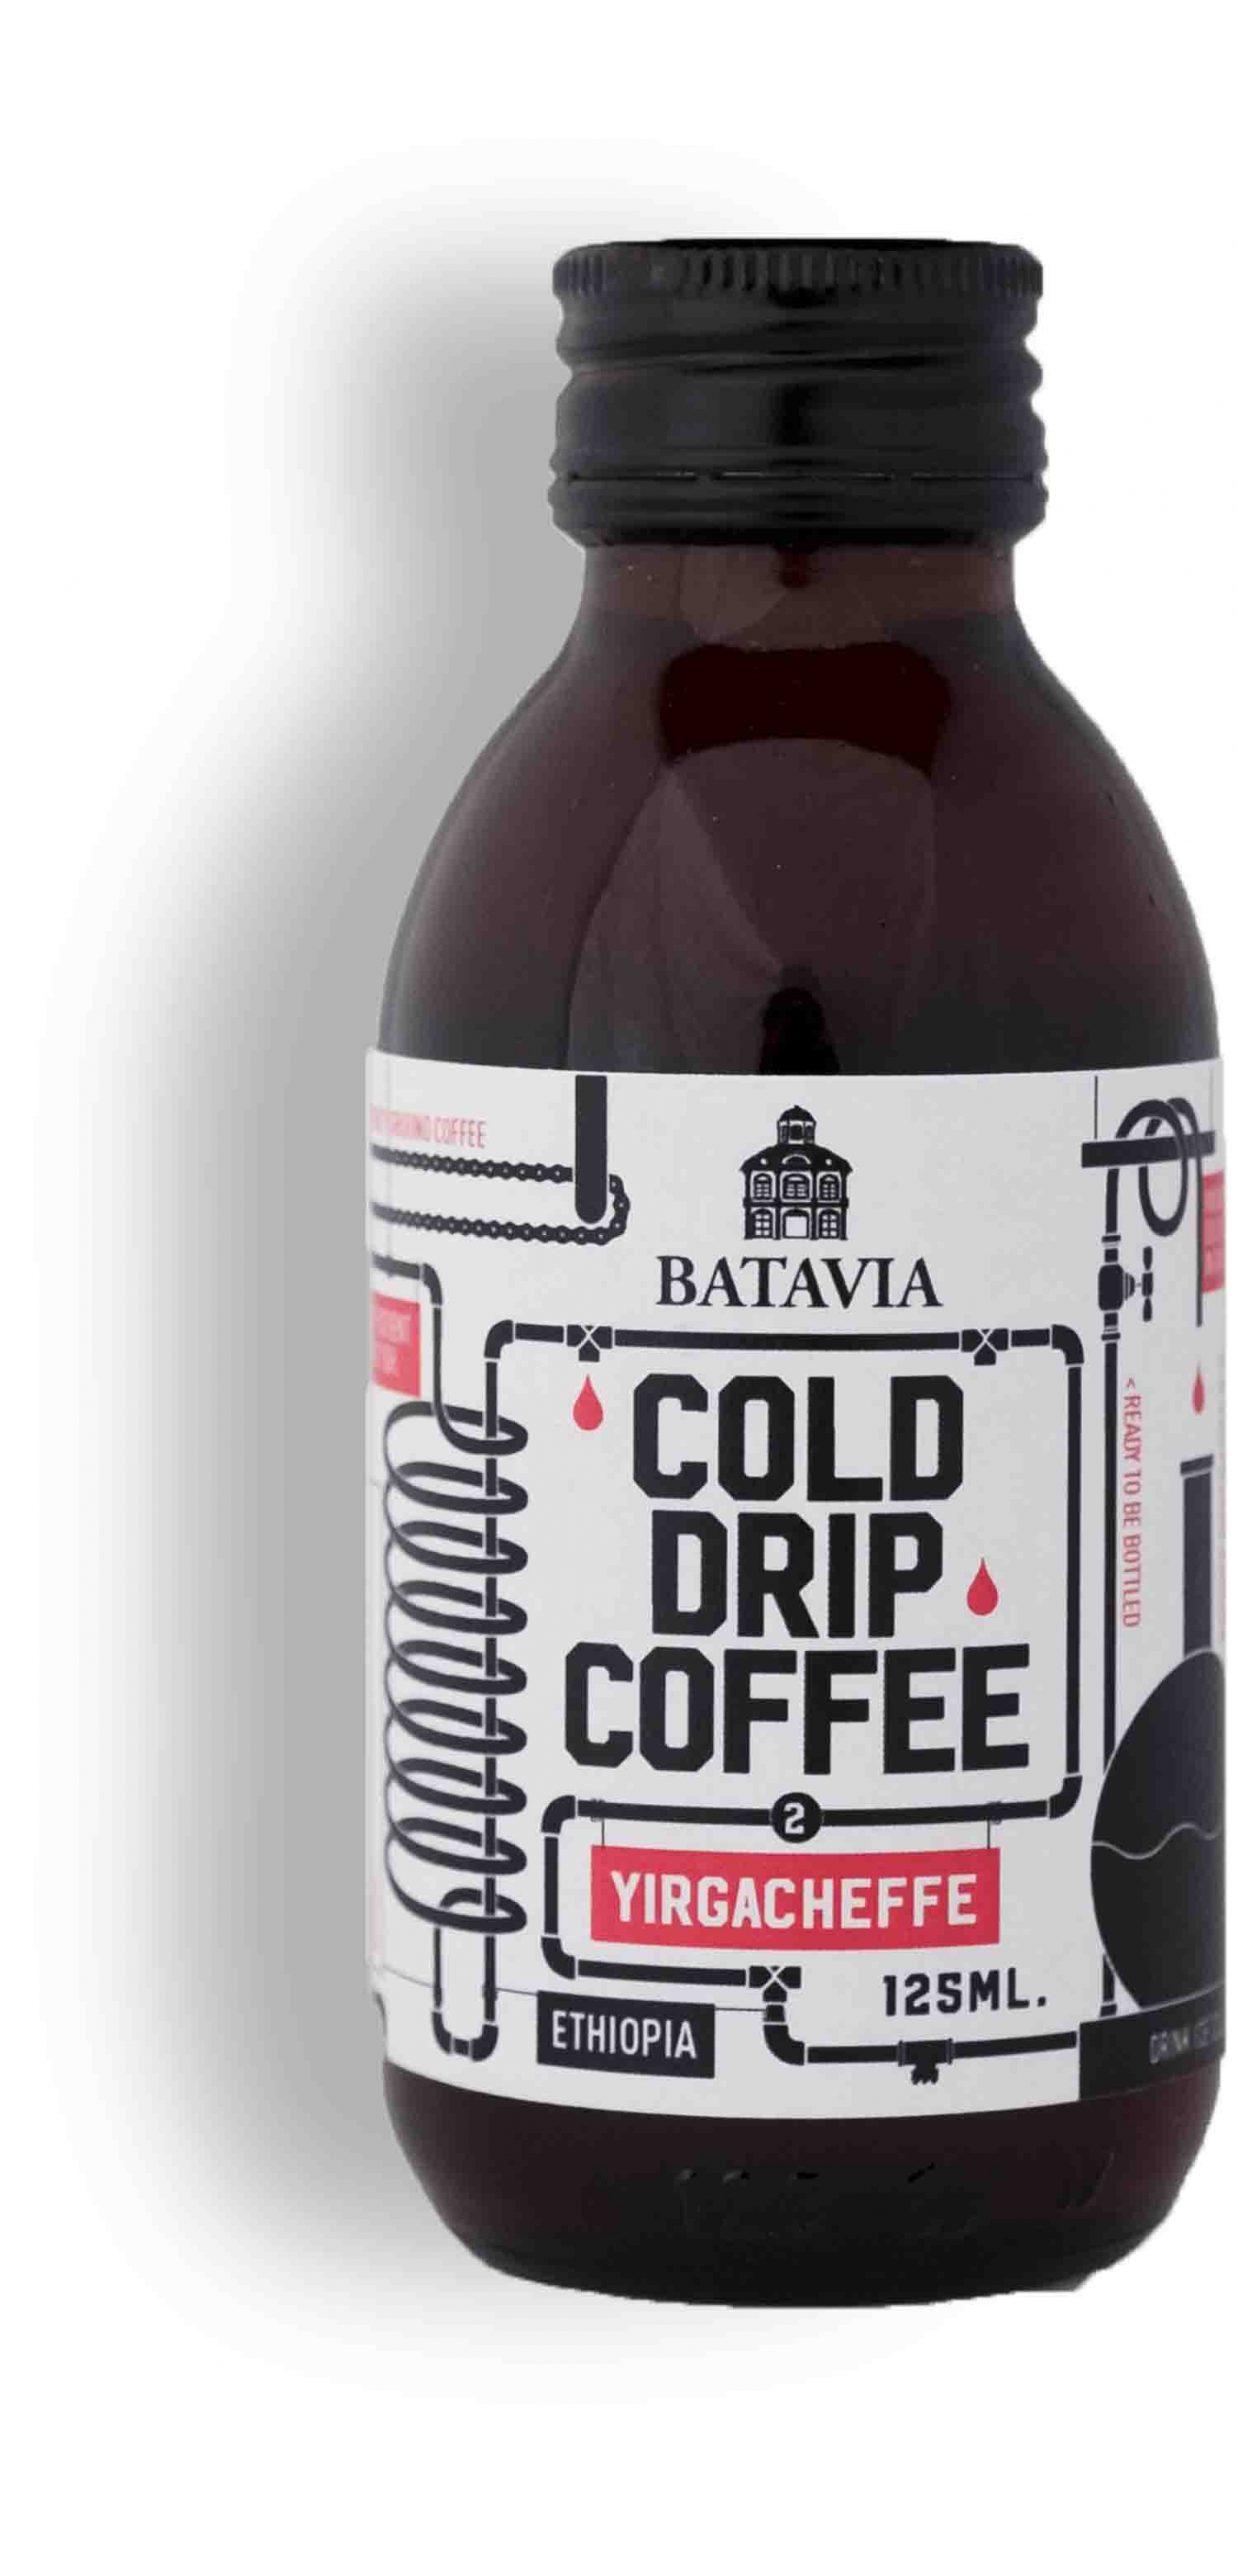 Batavia Cold Drip Coffee Yirgacheffe 125